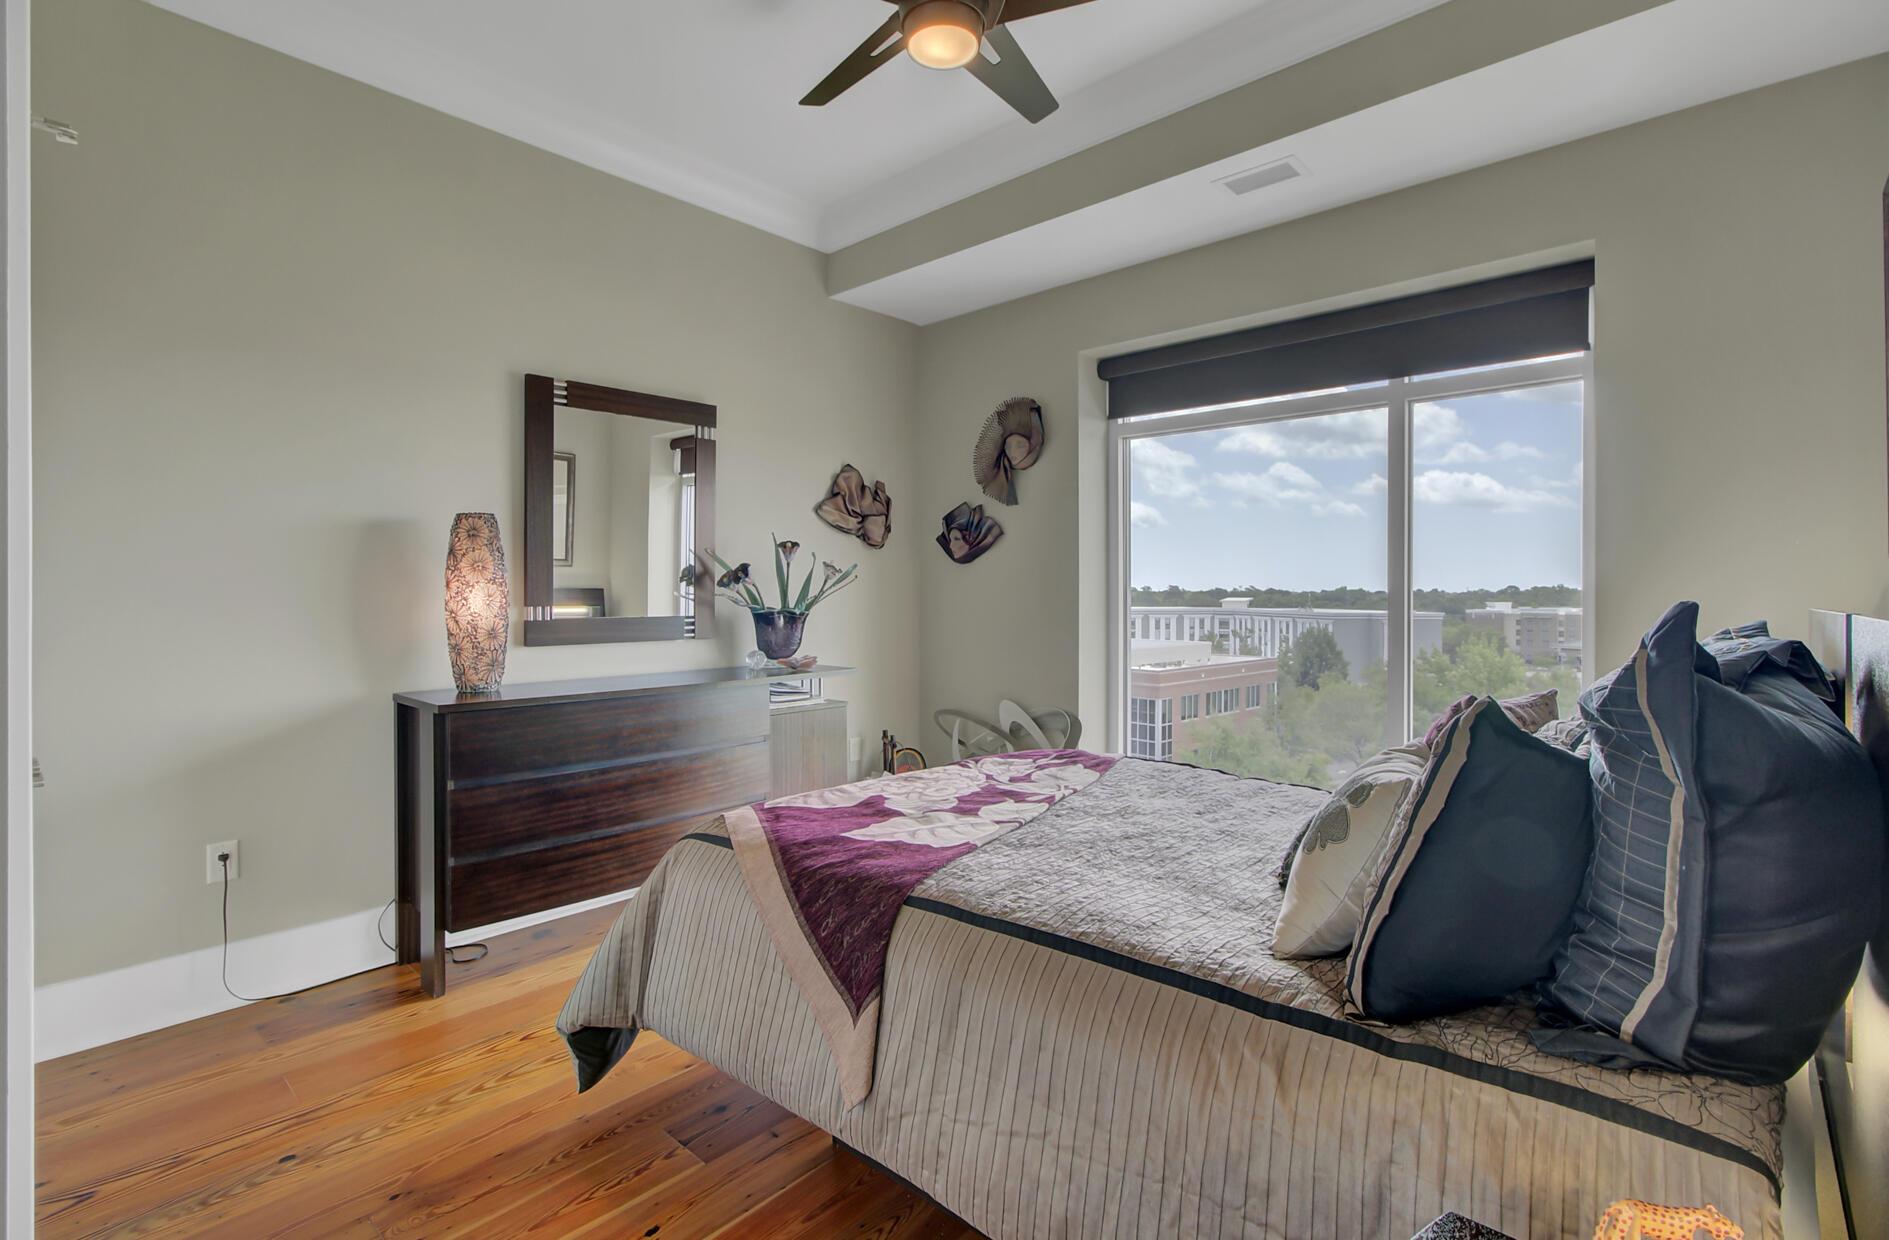 Tides IV Condominiums Homes For Sale - 155 Wingo Way, Mount Pleasant, SC - 28